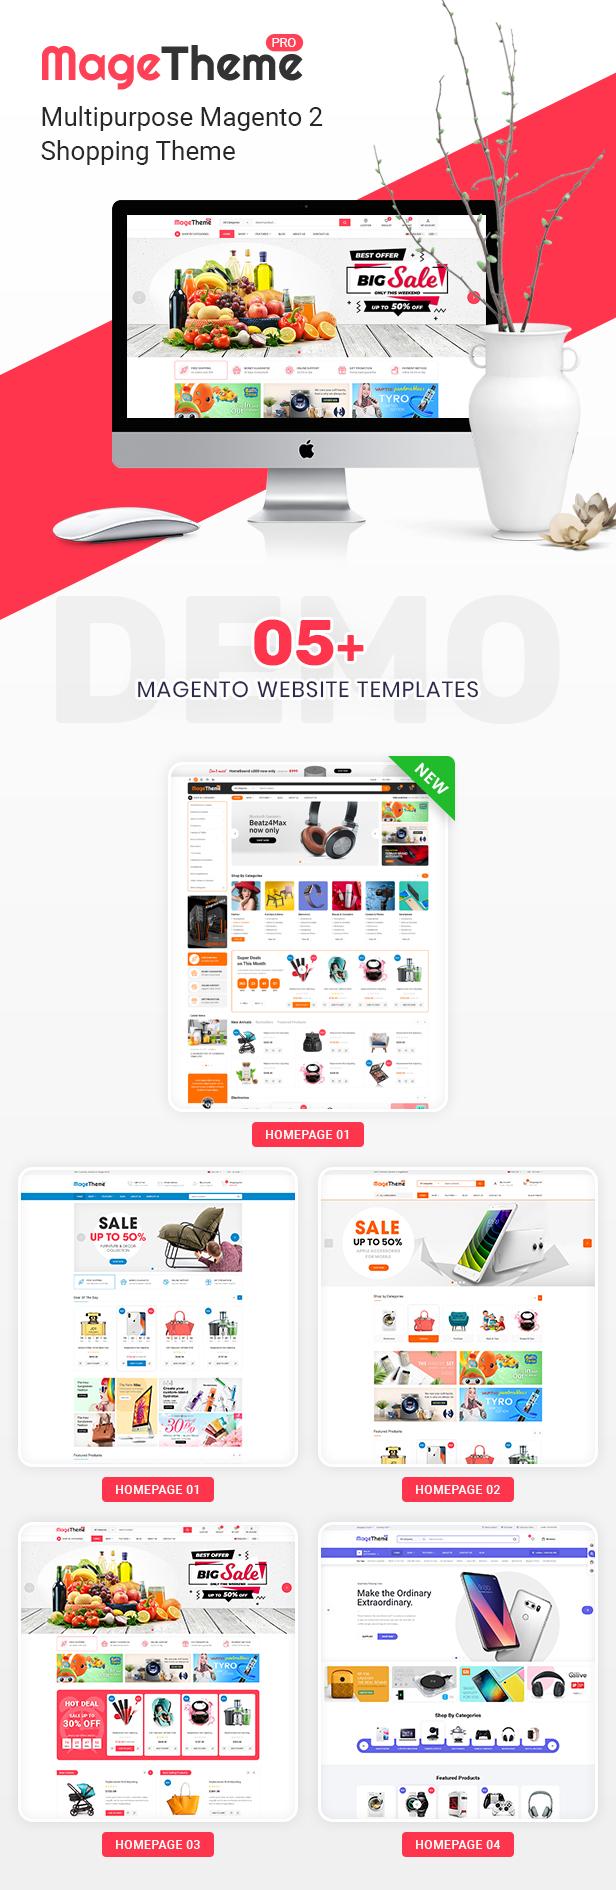 MageThemepro - Responsive Magento 2 Shopping Template - 3